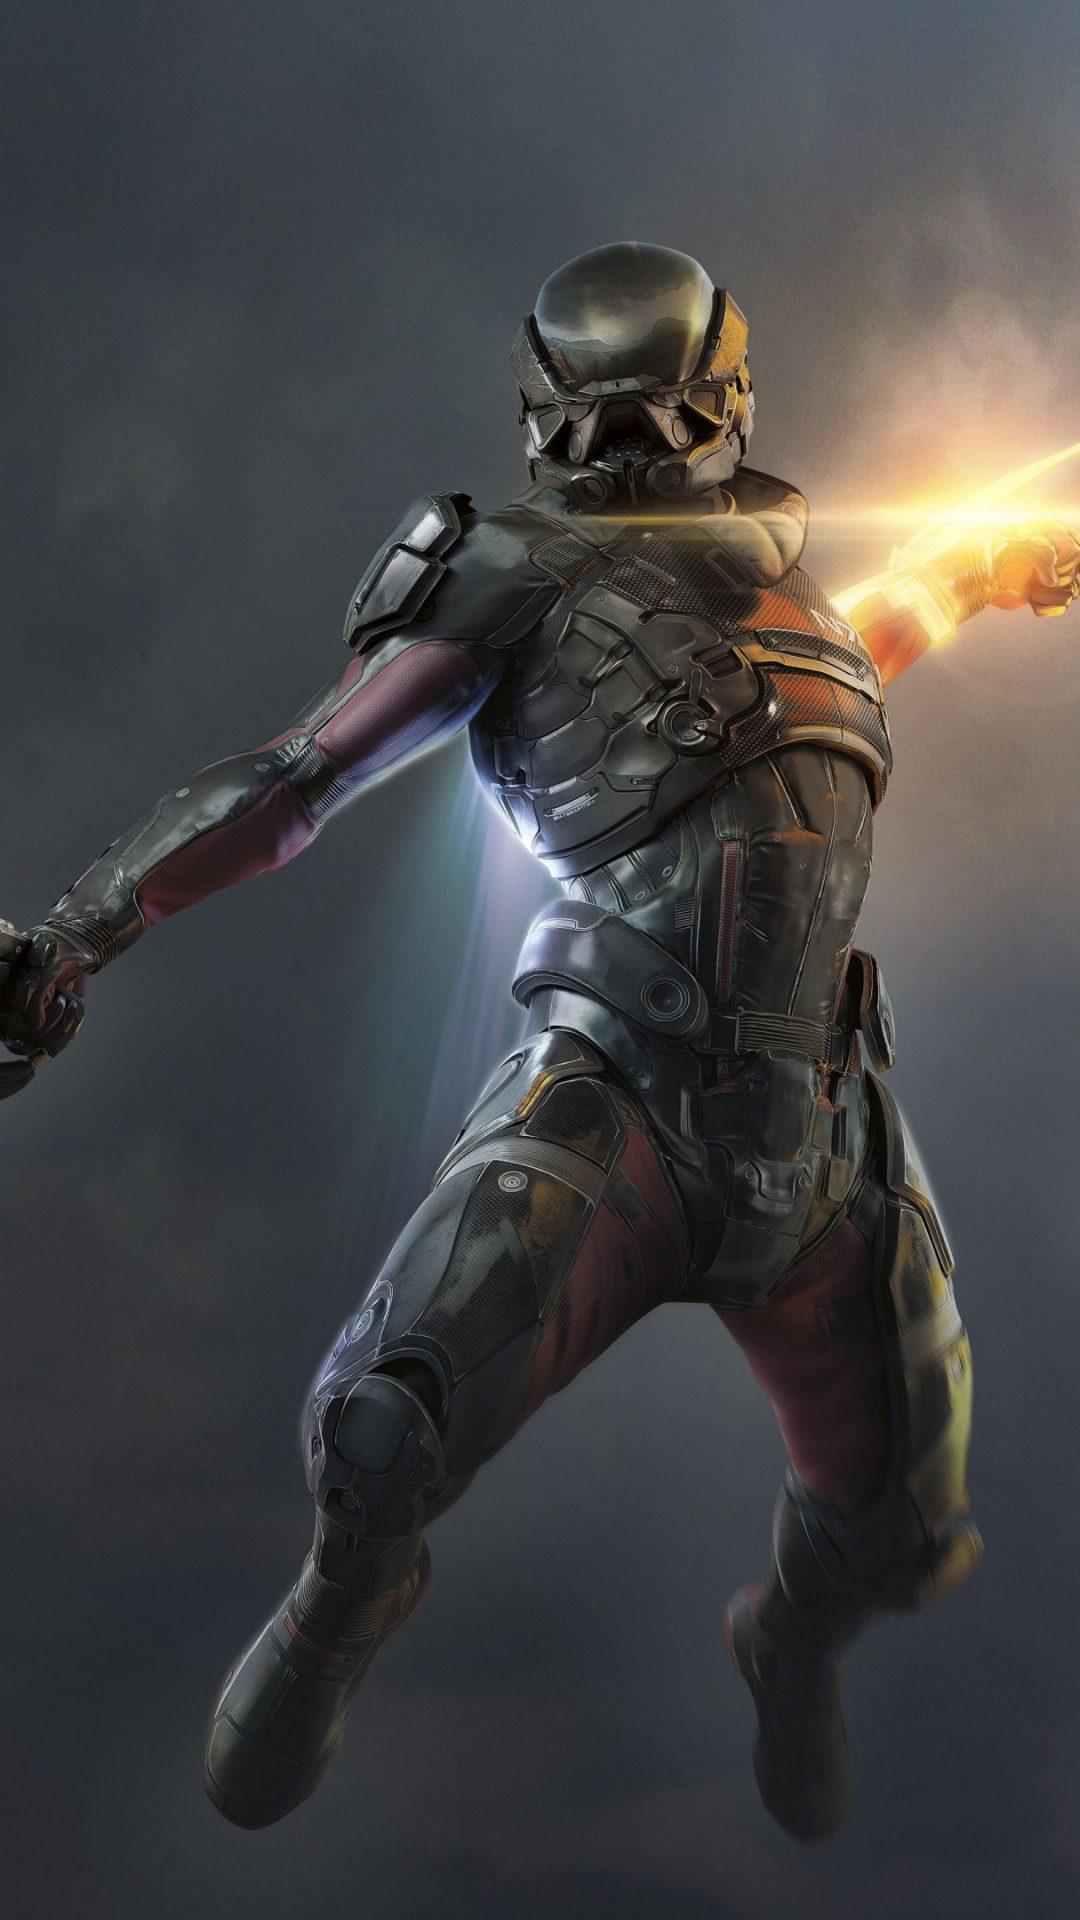 Mass Effect Andromeda 4K Wallpaper   HD Wallpaper Background